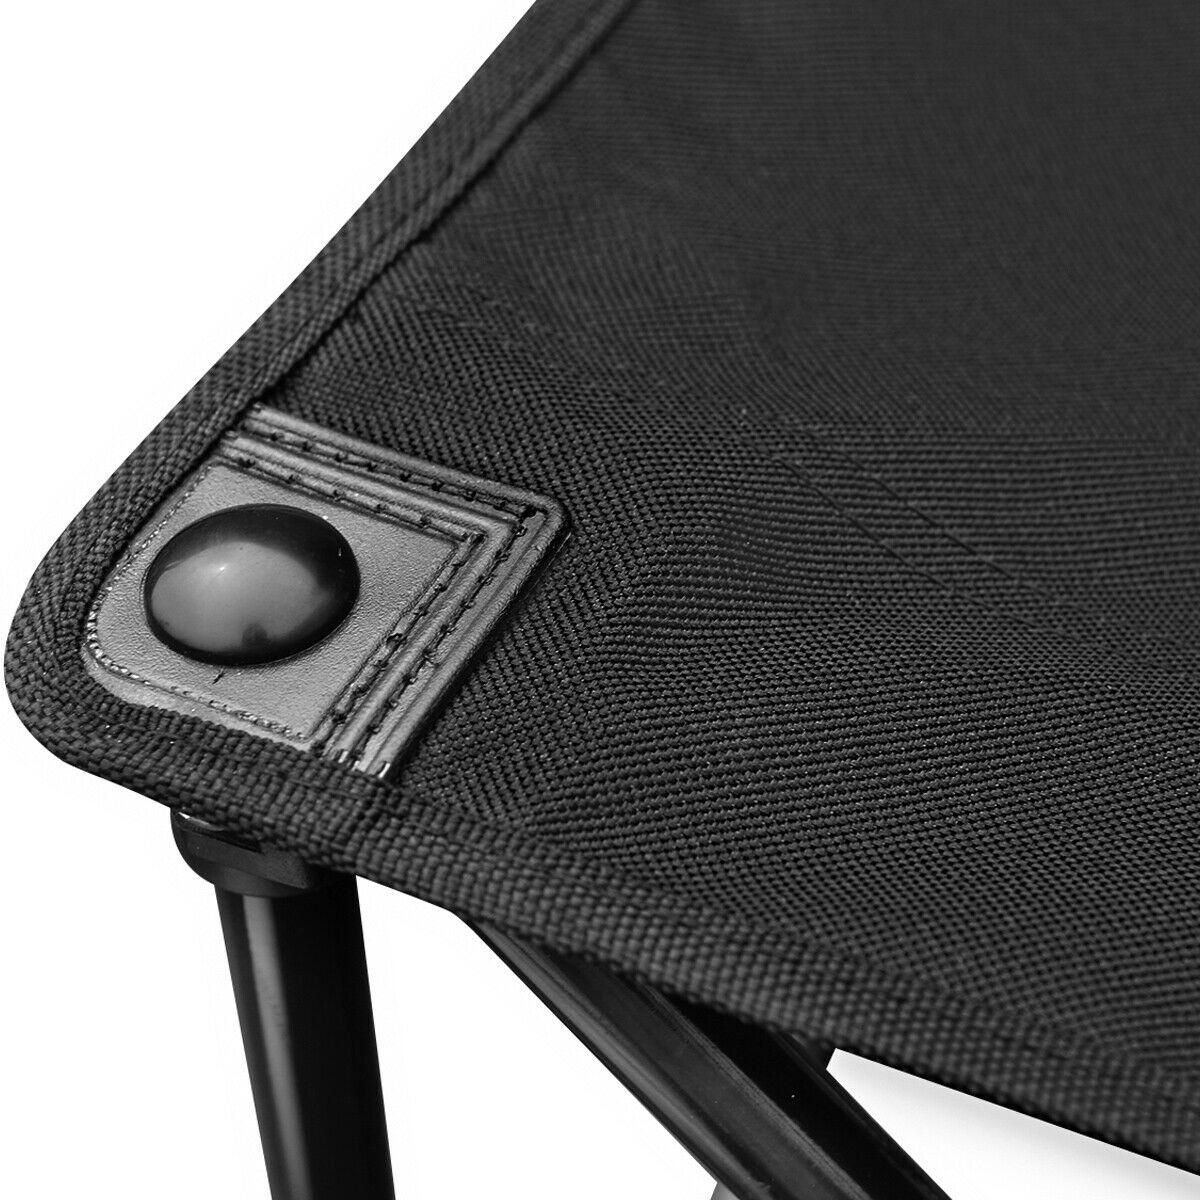 Black/Red Portable 6 Seats Folding Chair W/Carry Bag-Black